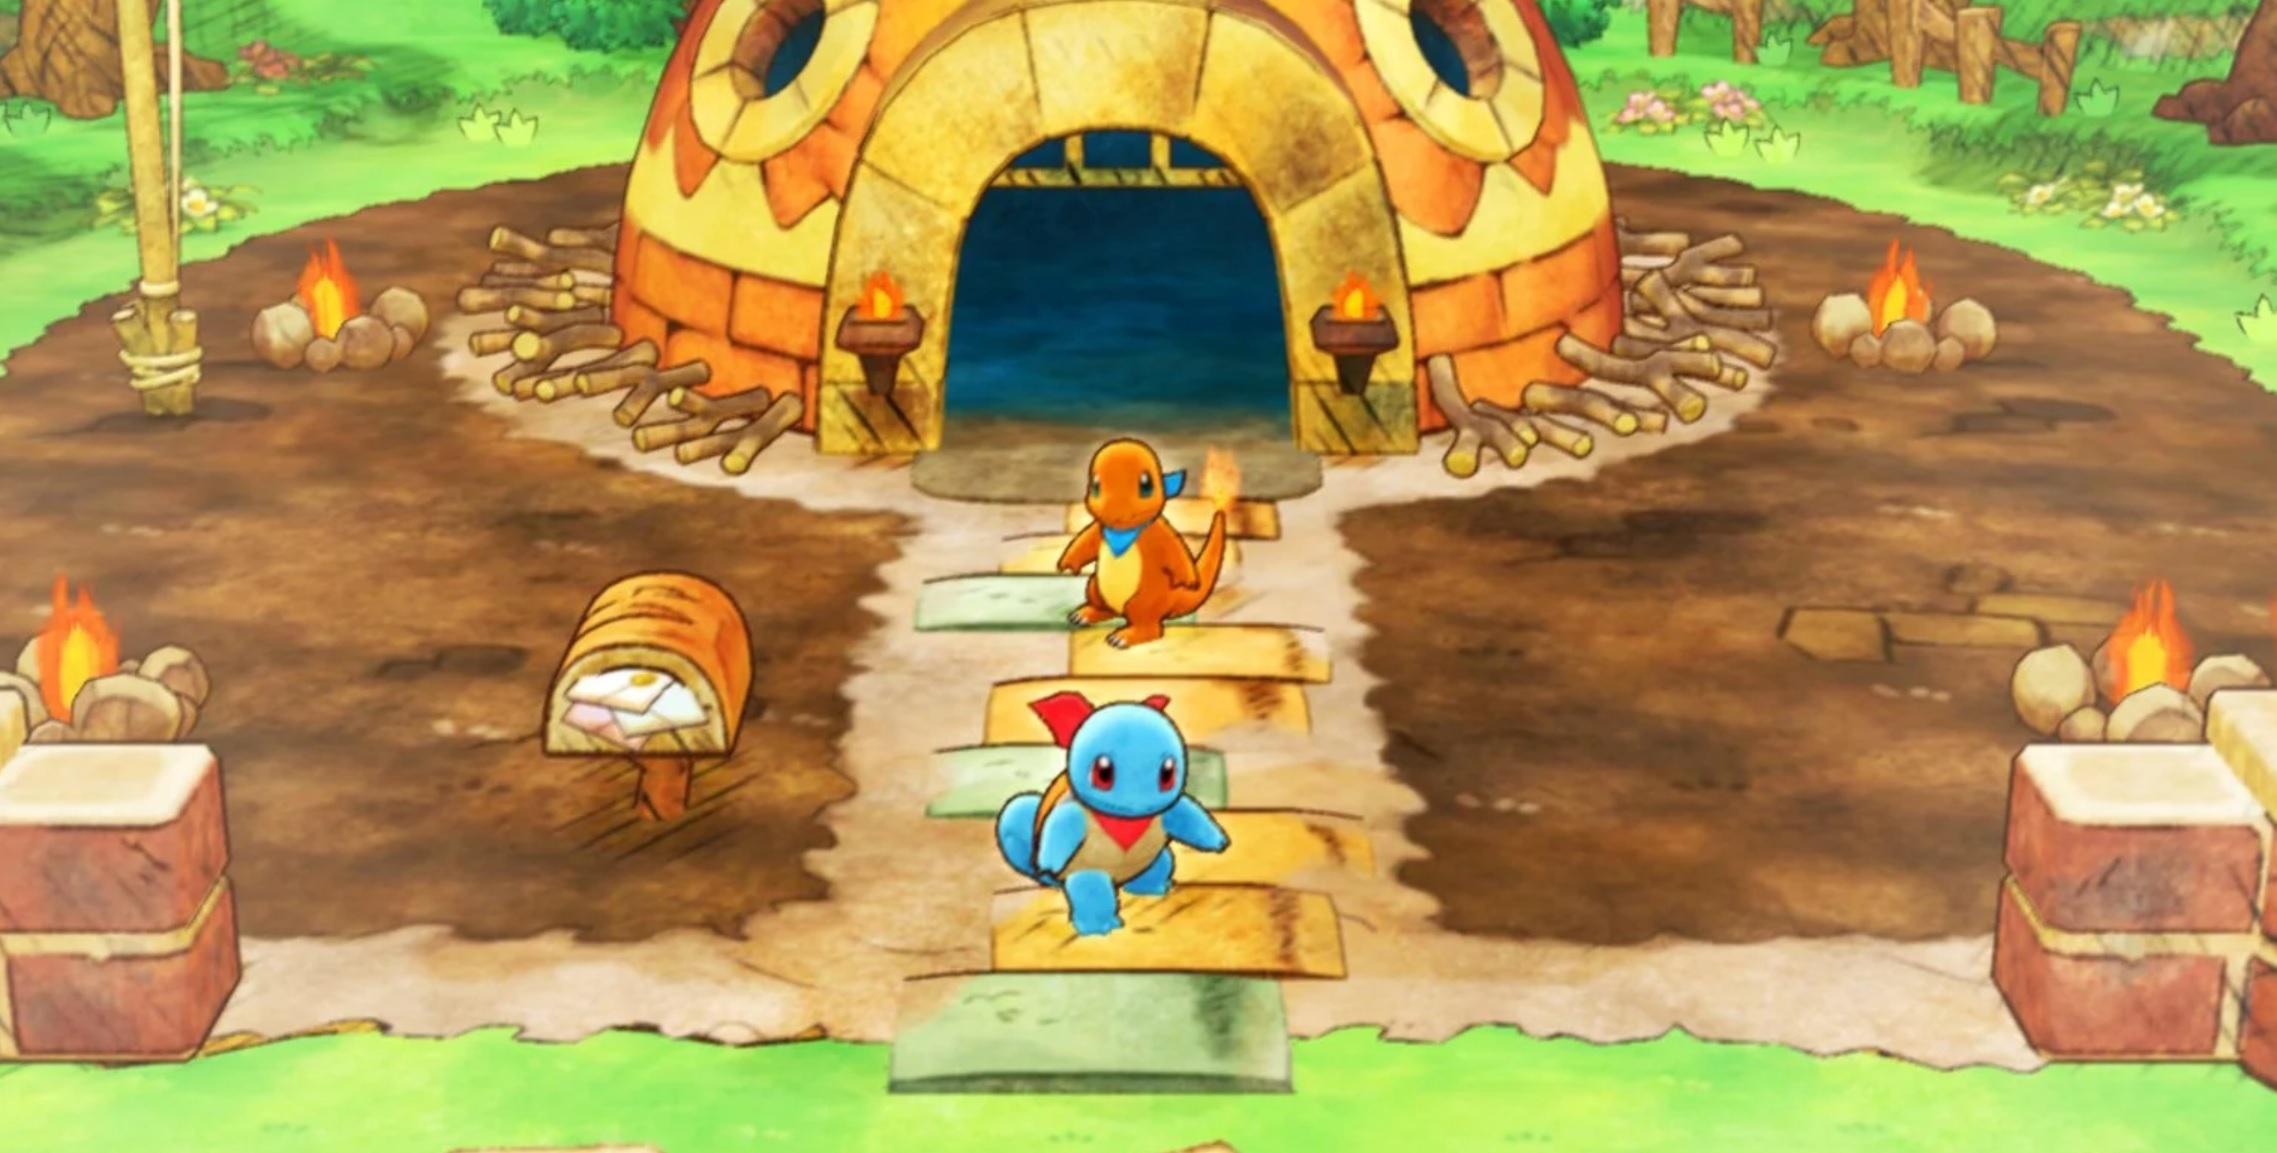 Nintendo Download: Pokemon Mystery Dungeon: Rescue Team DX screenshot